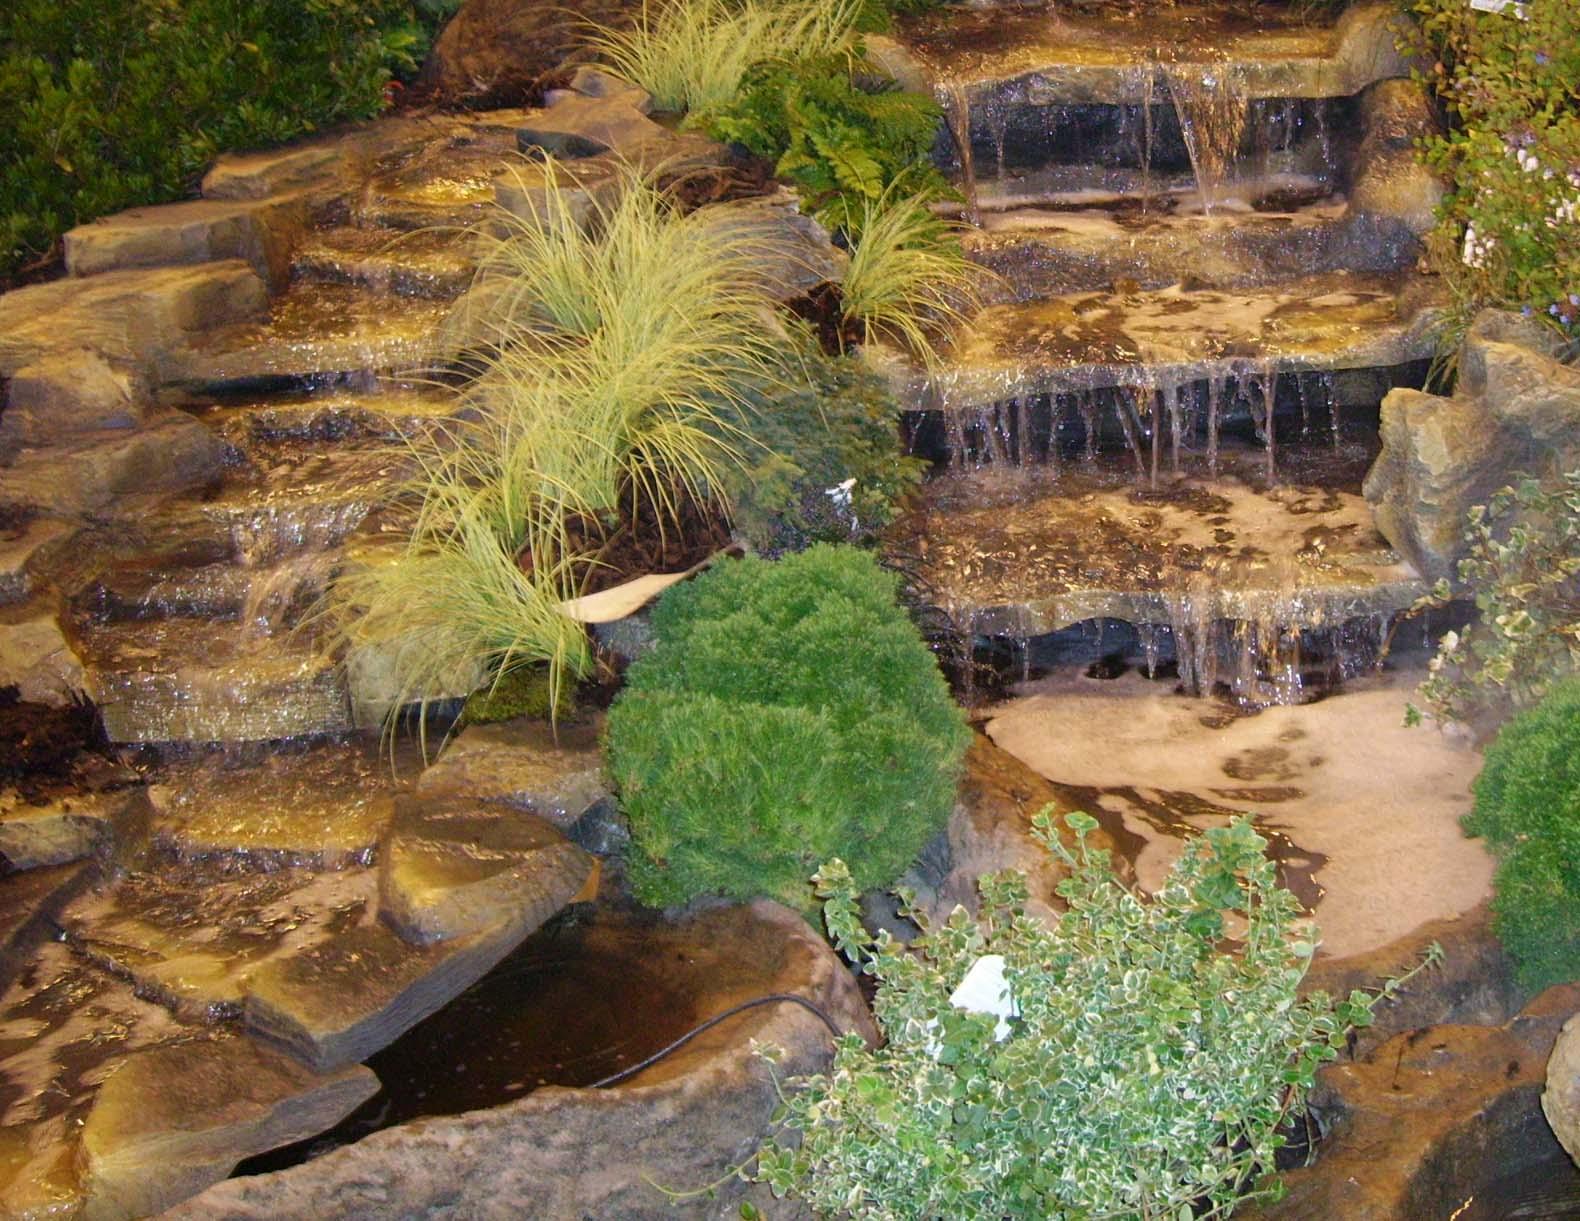 Cuisine: Ment Construire Sa Cascade Expert Bassin Comment ... avec Bassin De Jardin Pas Cher